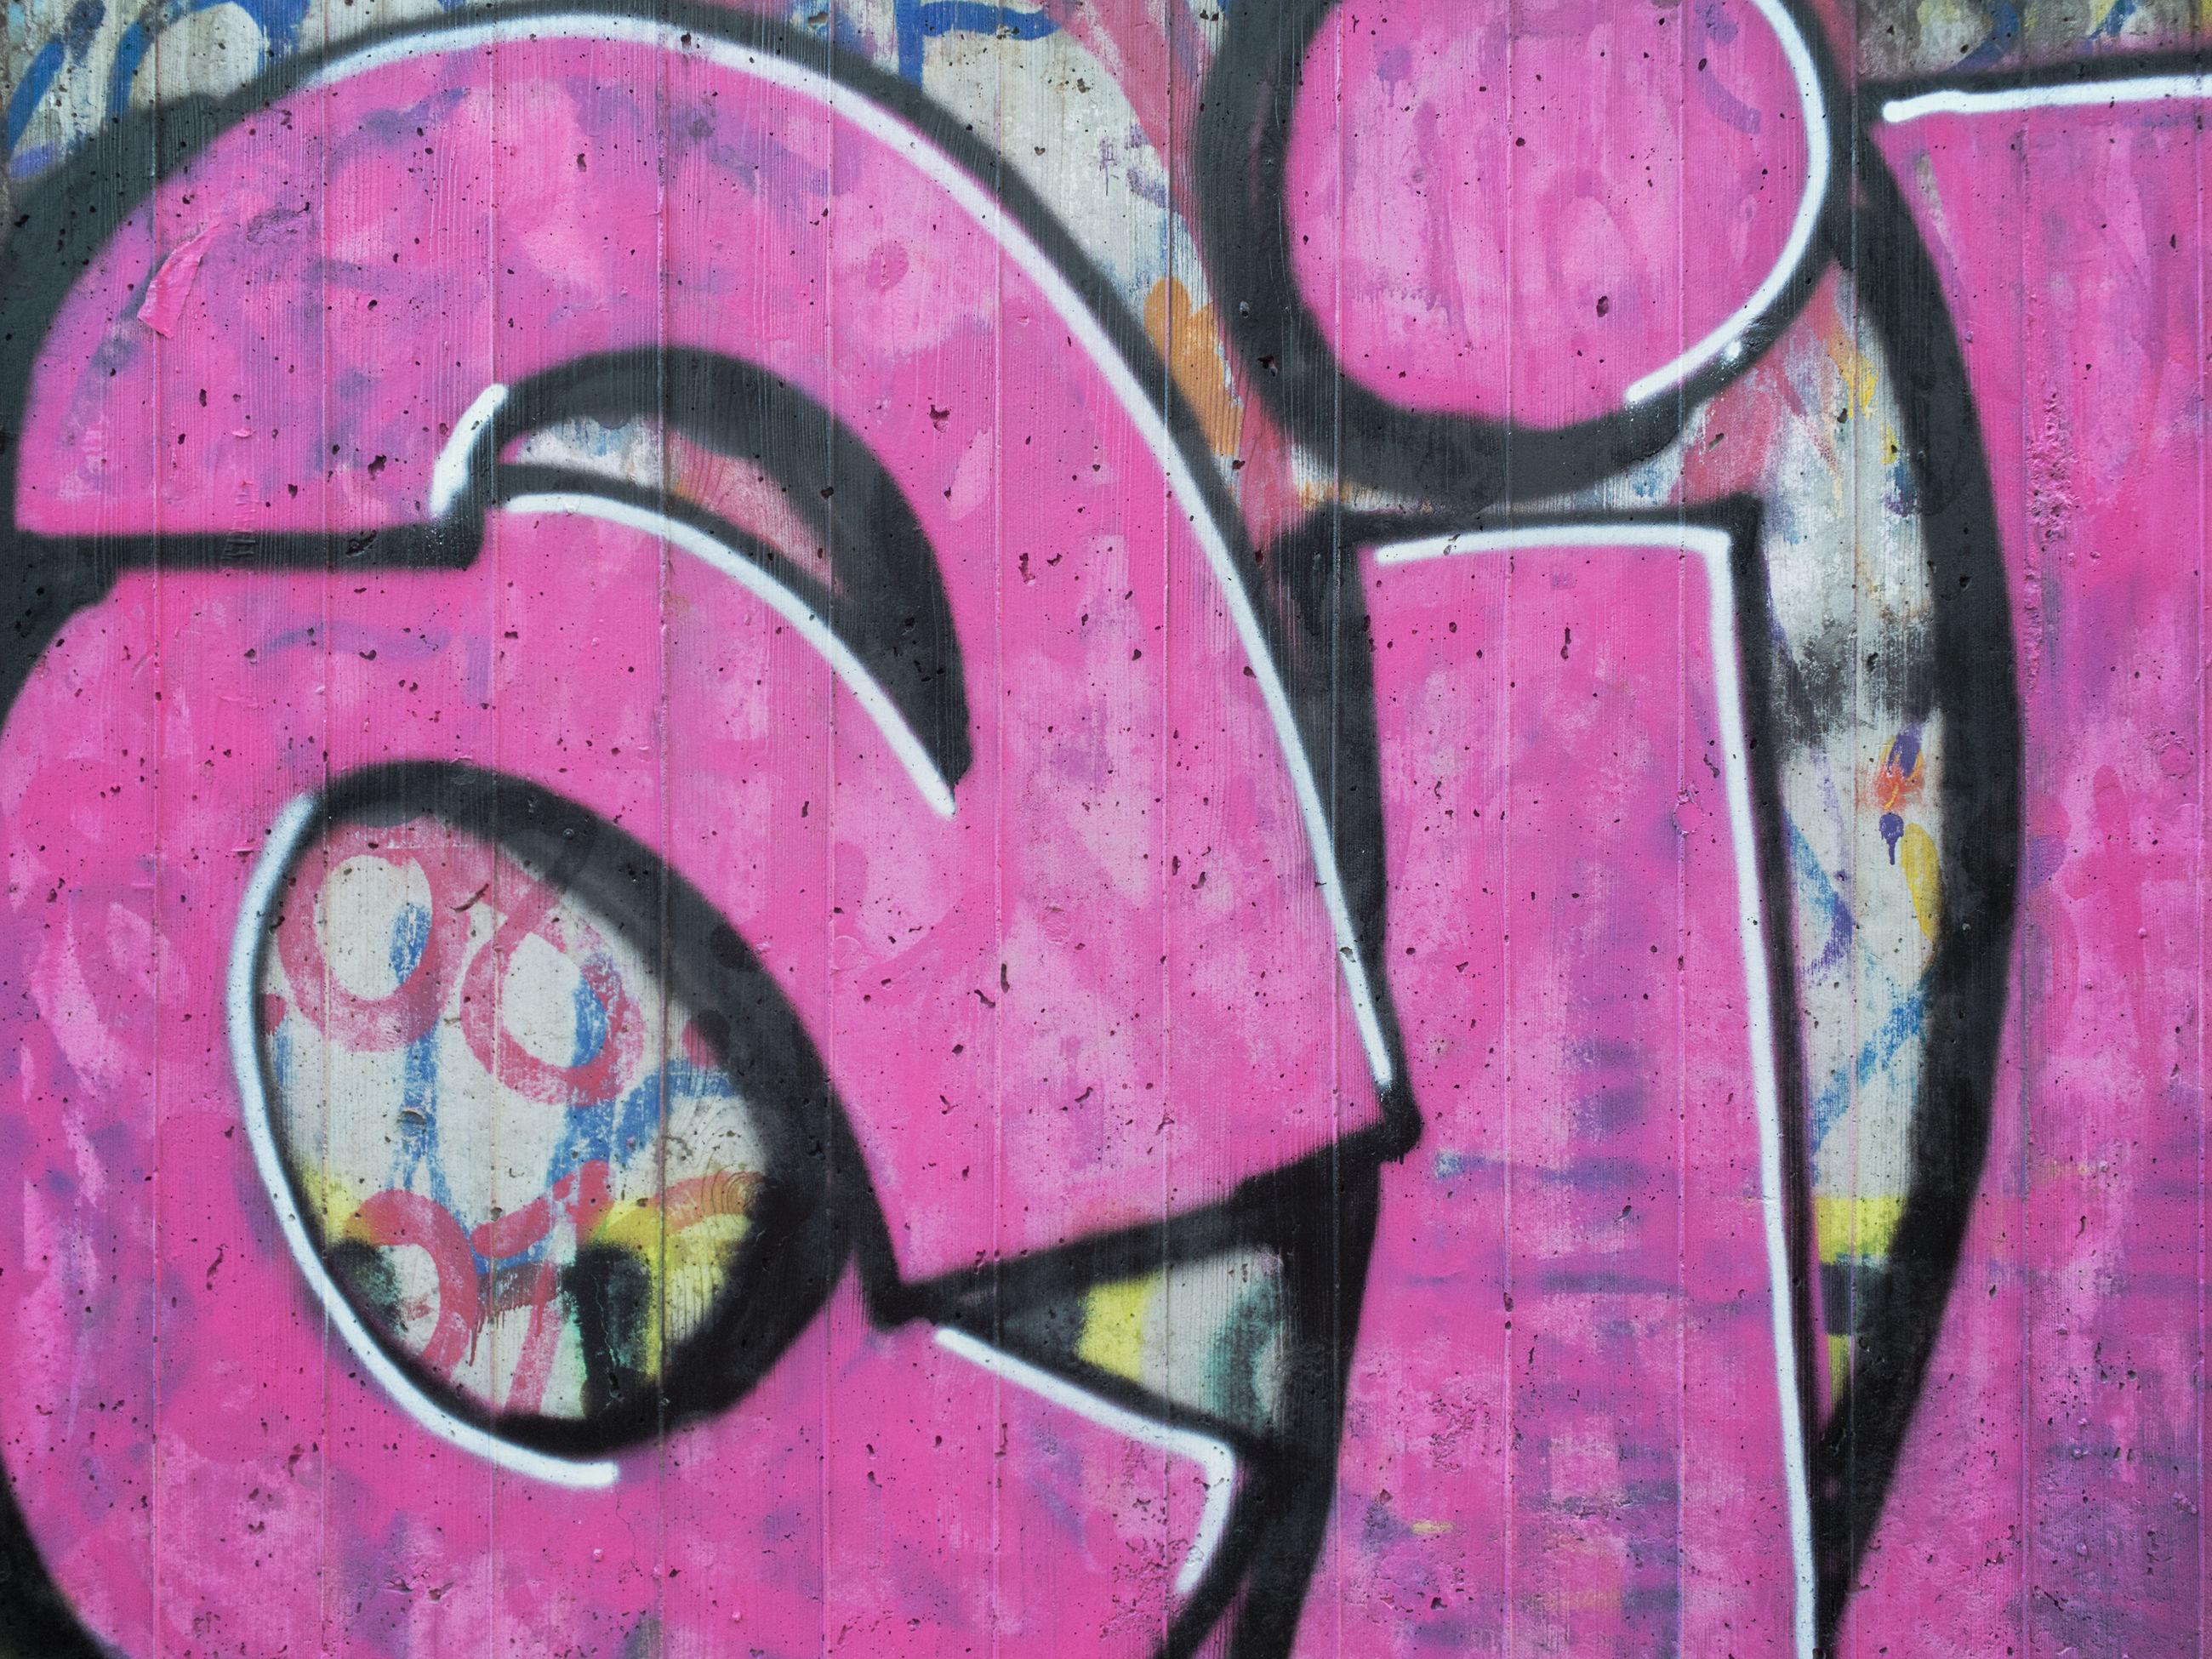 CLOSE-UP OF GRAFFITI ON METAL